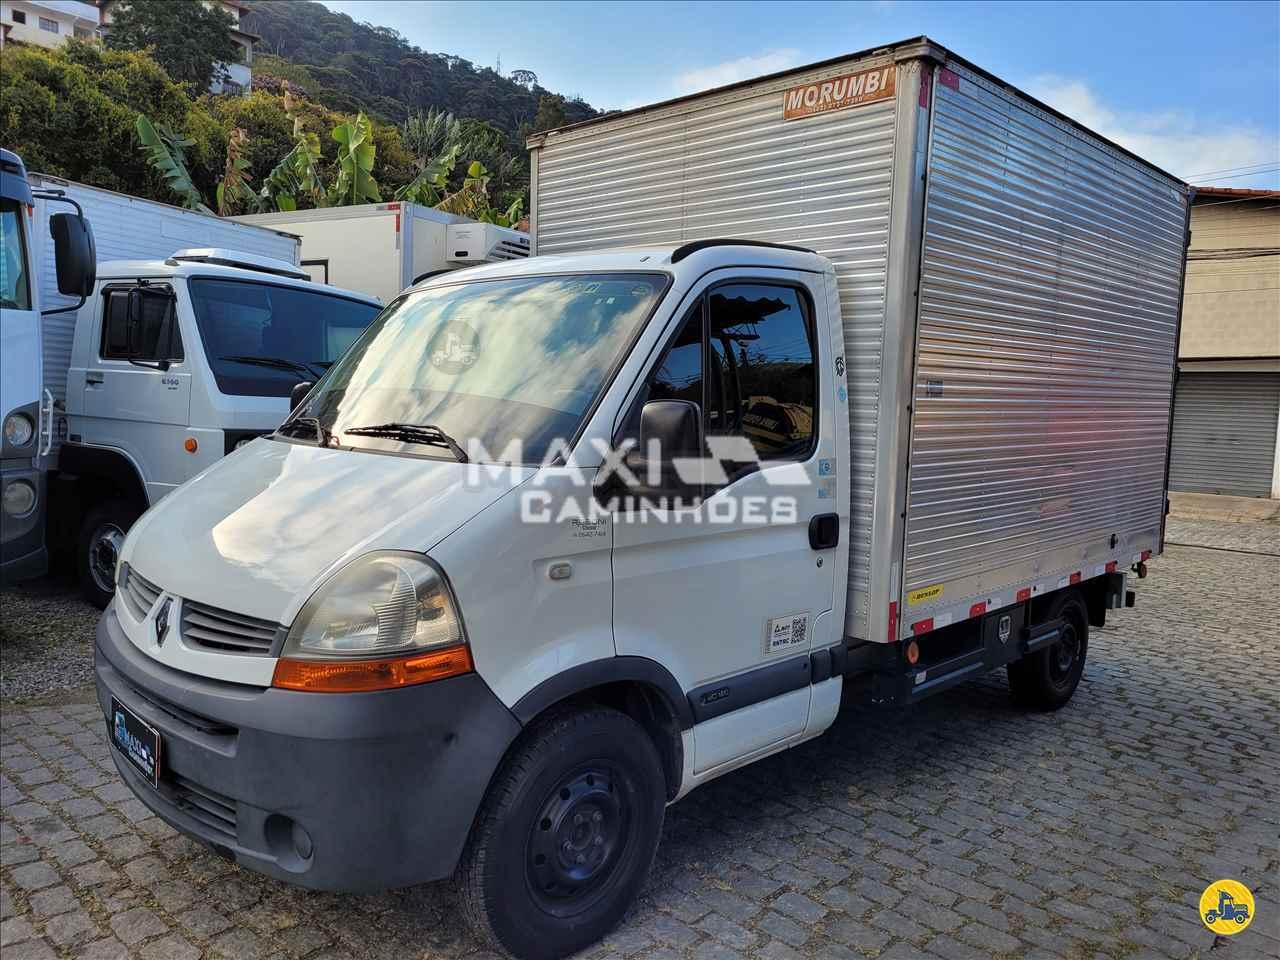 UTILITARIOS RENAULT Master Chassi Cabine 2.5 Maxi Caminhões TERESOPOLIS RIO DE JANEIRO RJ